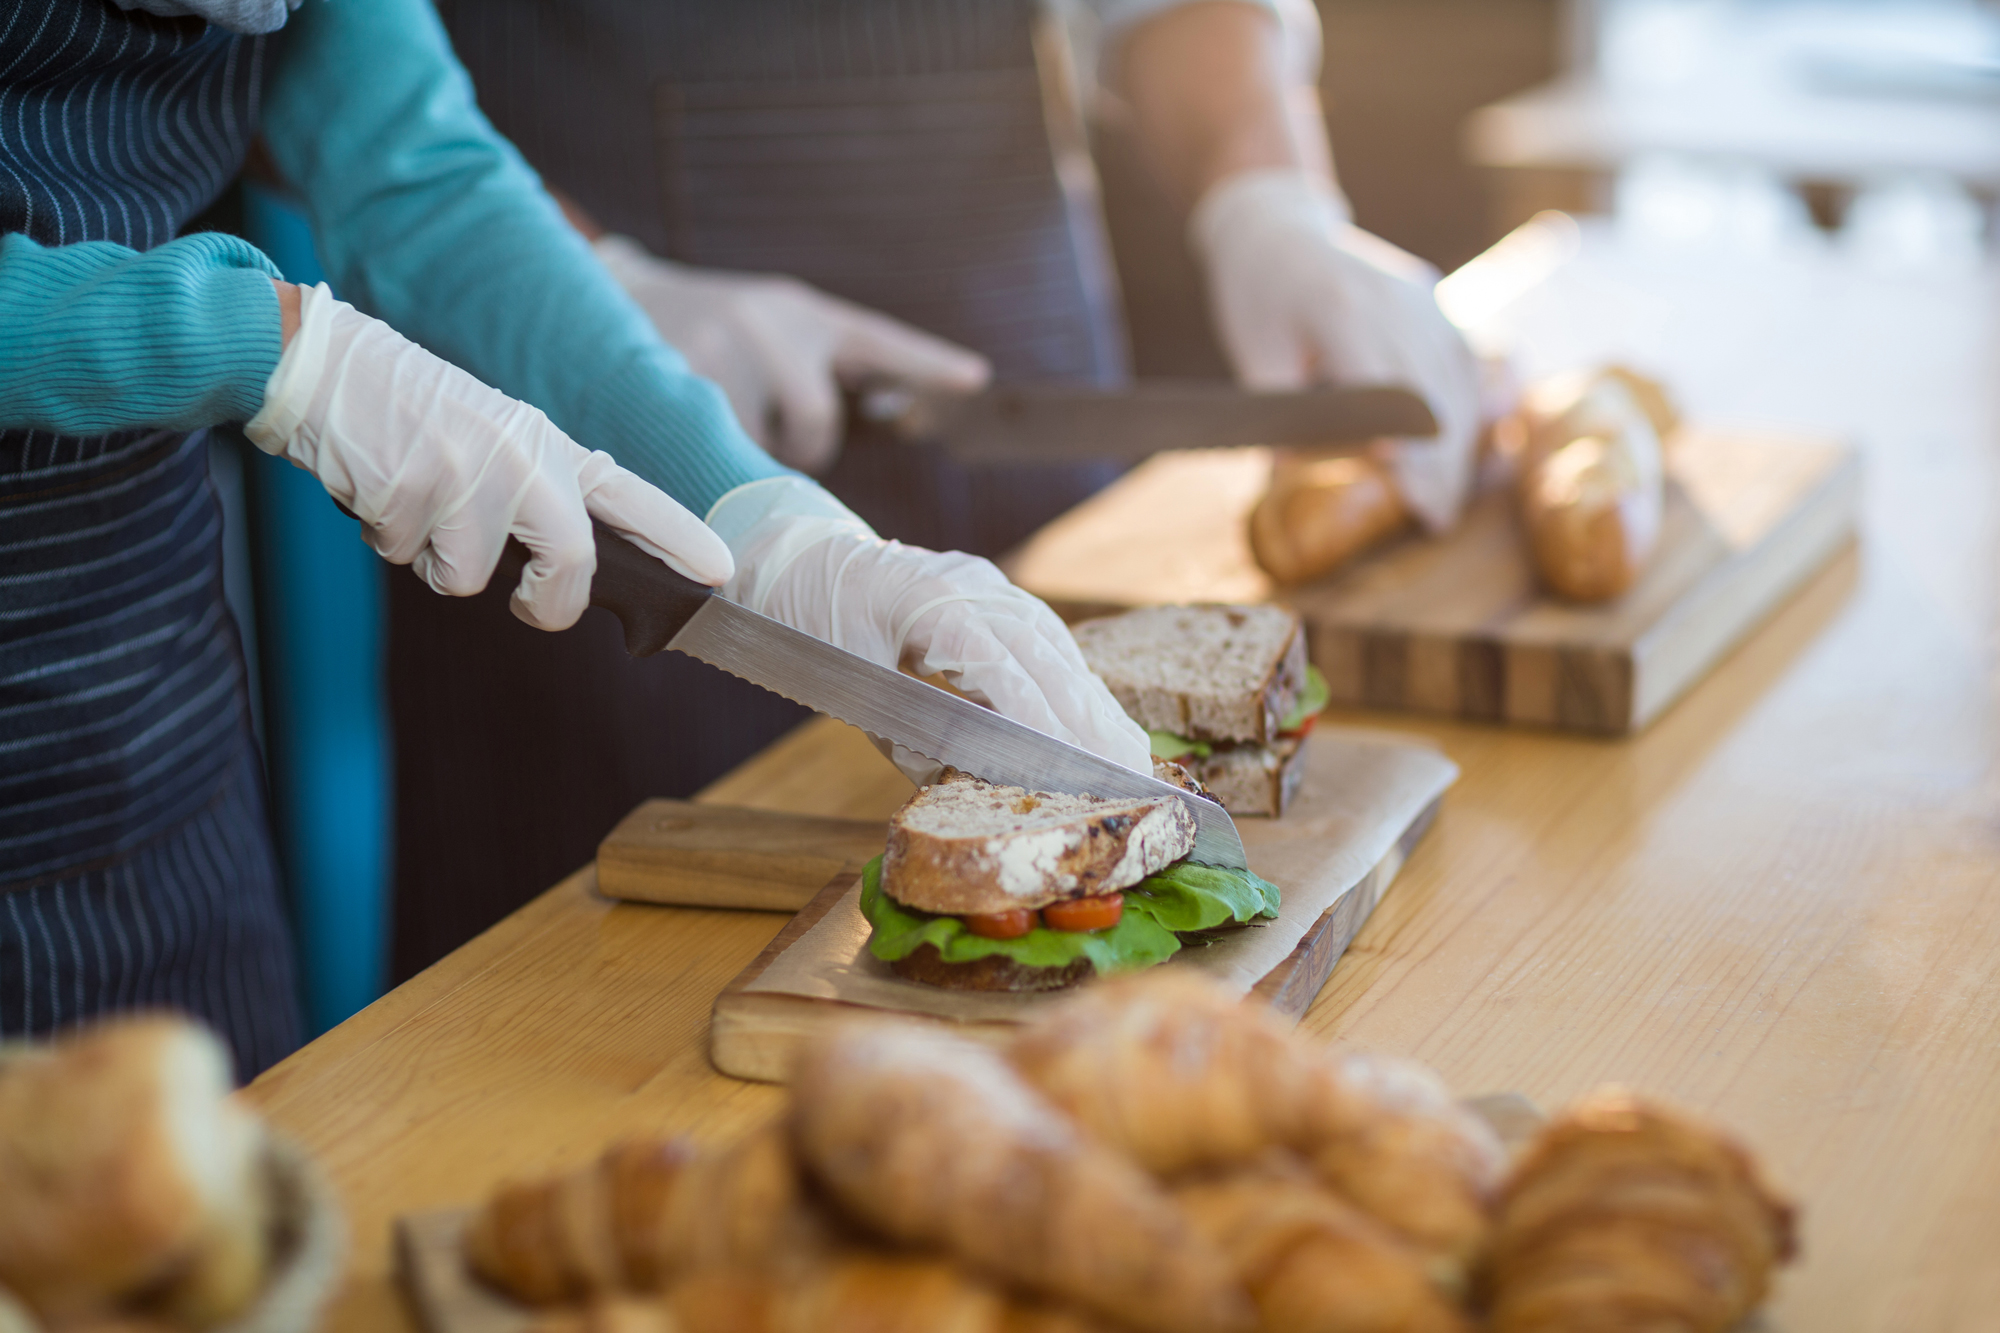 Restaurant Employee Cutting Sandwich While Wearing Gloves